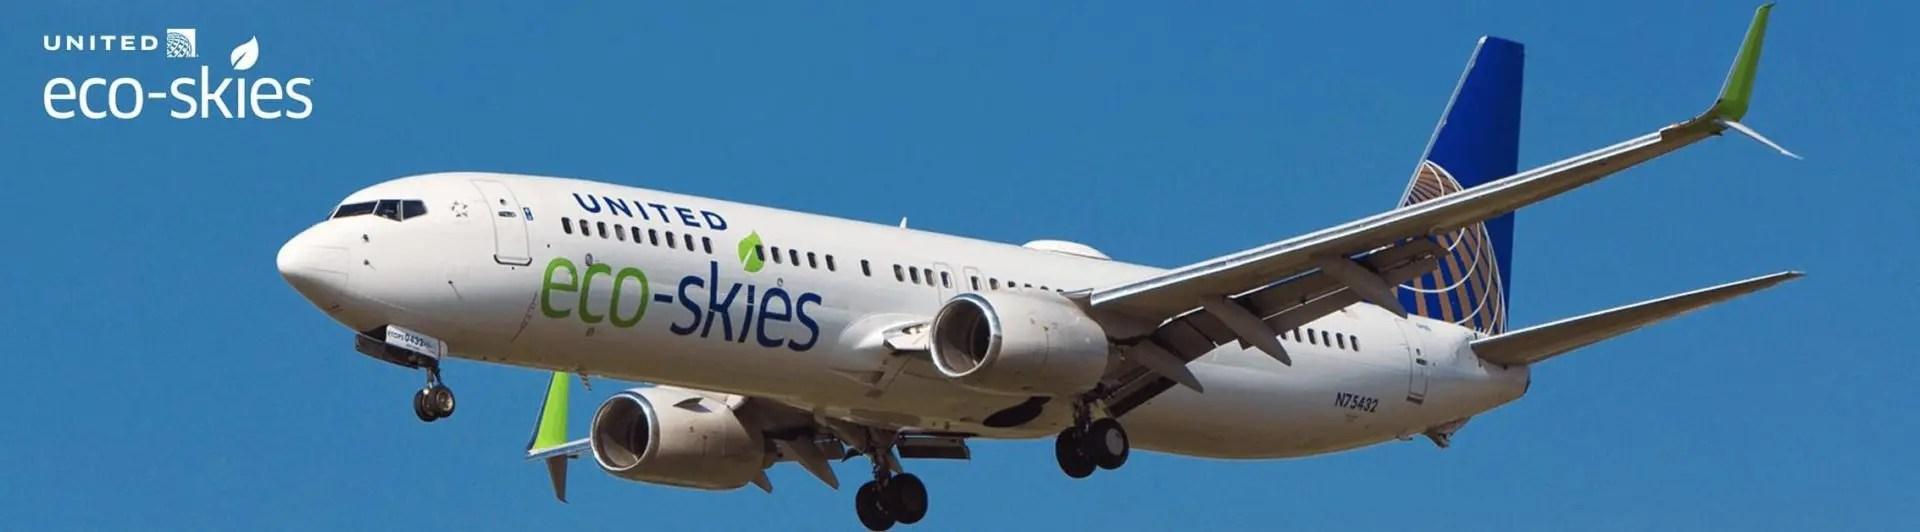 United aeronaves elétricas